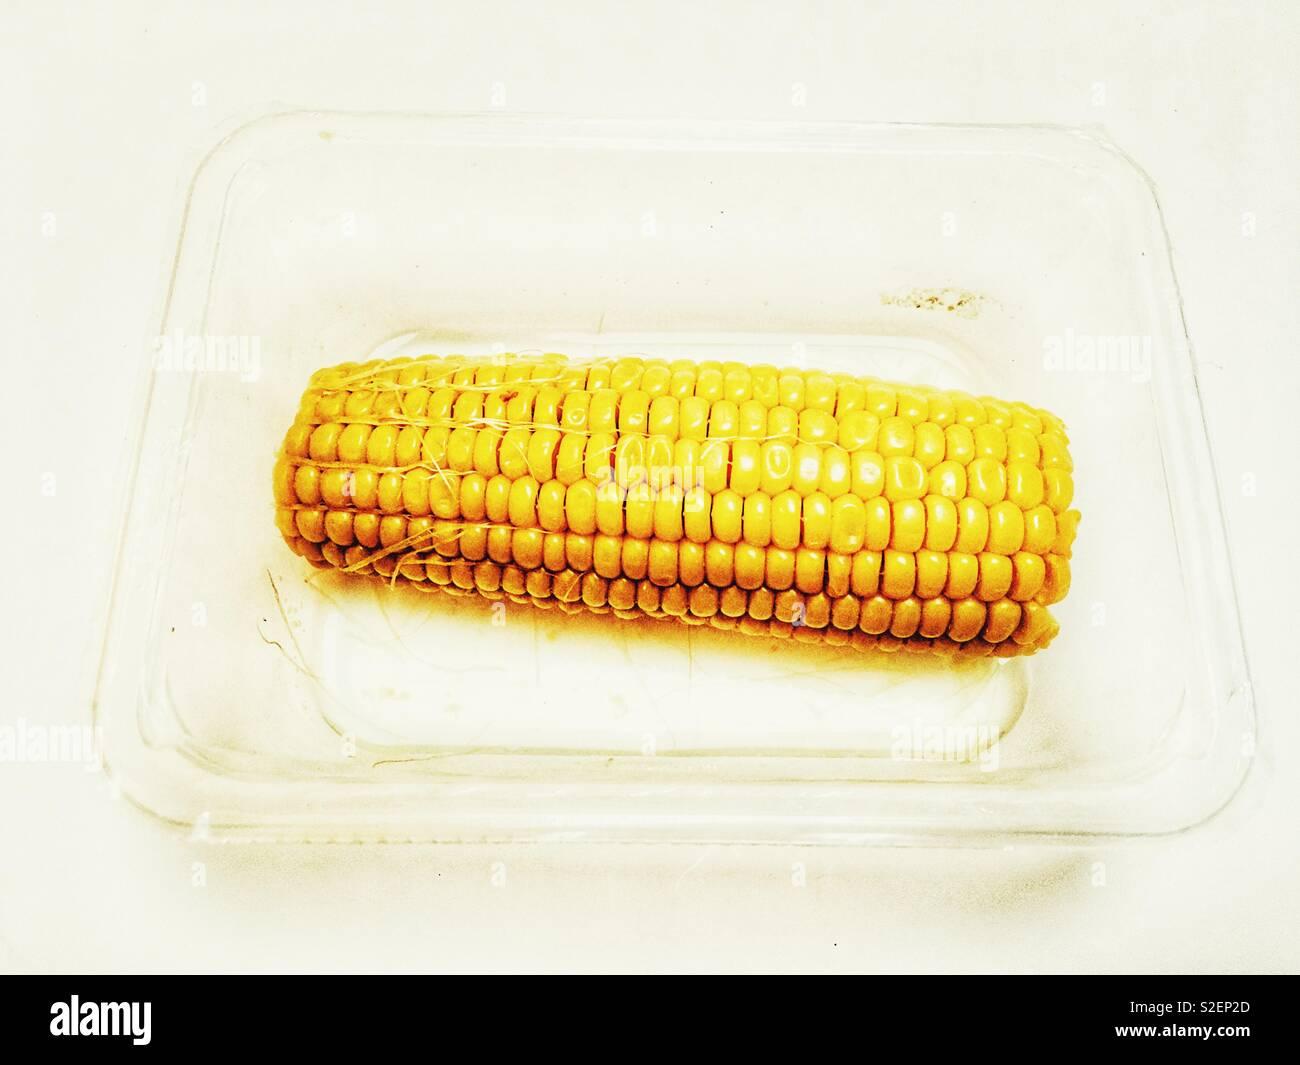 Microwaved corn on the cob - Stock Image